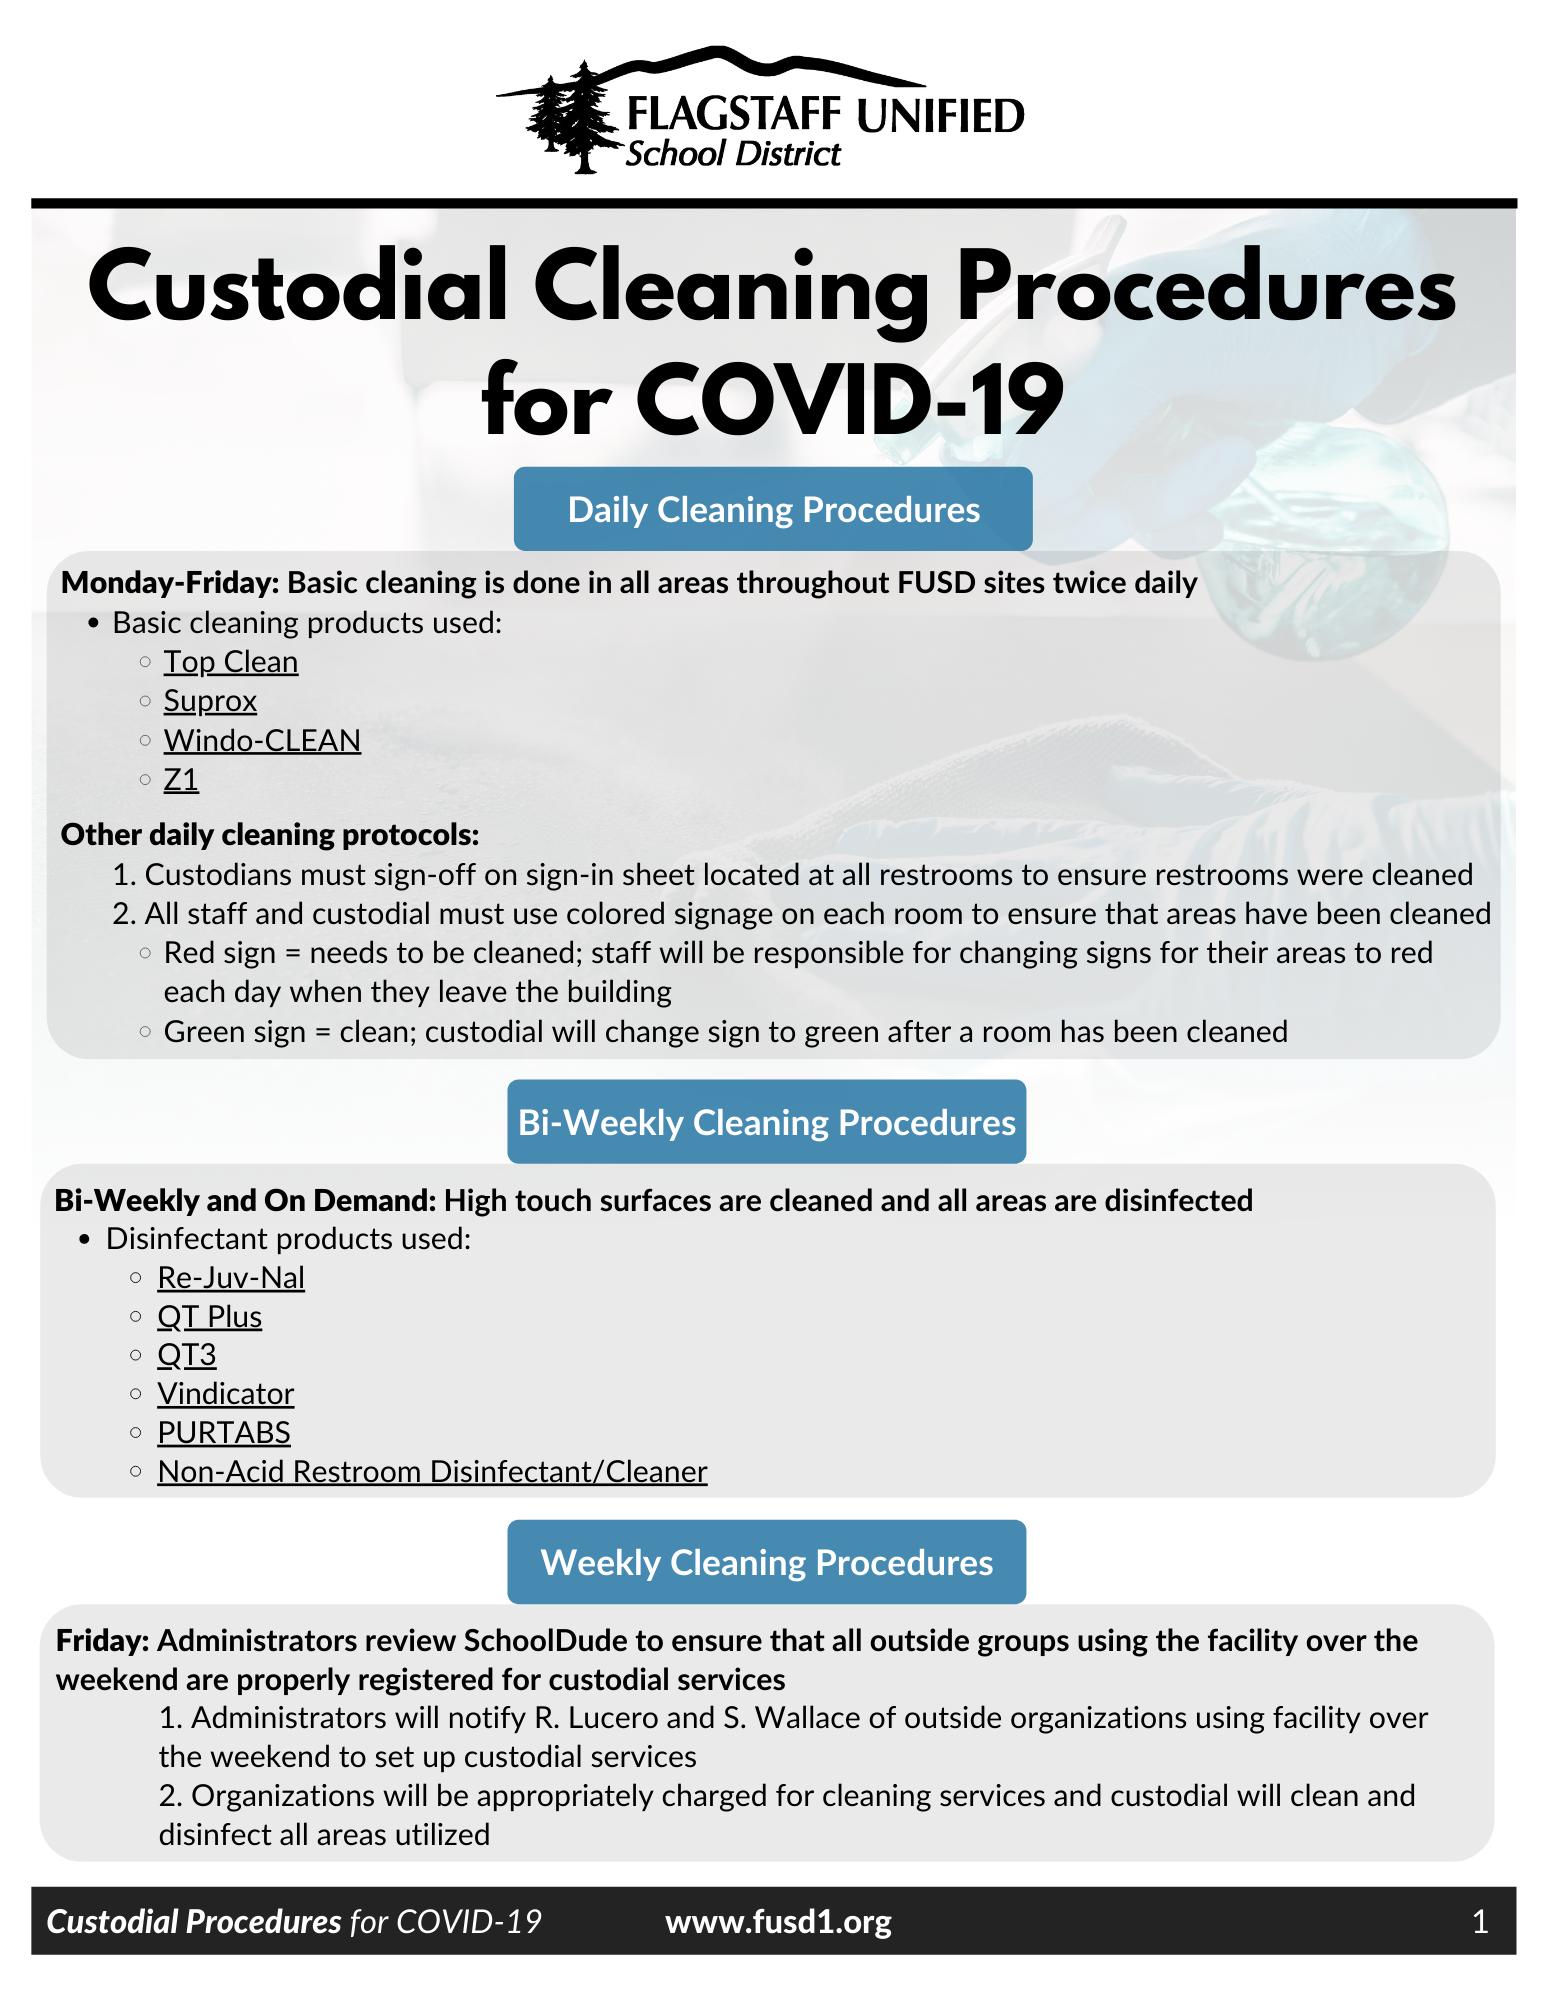 Custodial Cleaning Procedures